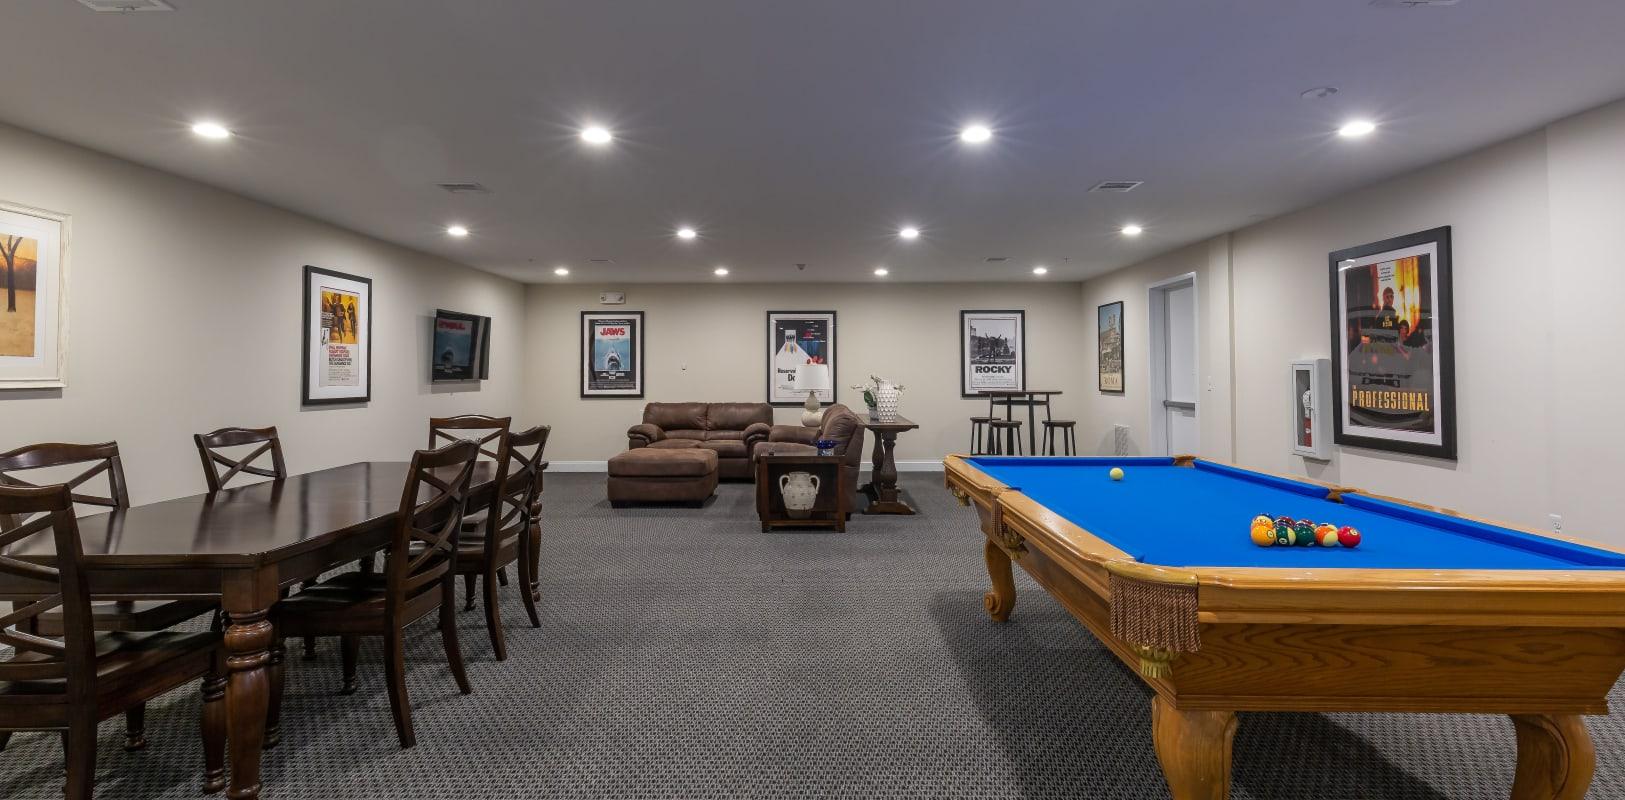 Billiard table in common area at Zephyr Ridge in Cedar Grove, New Jersey